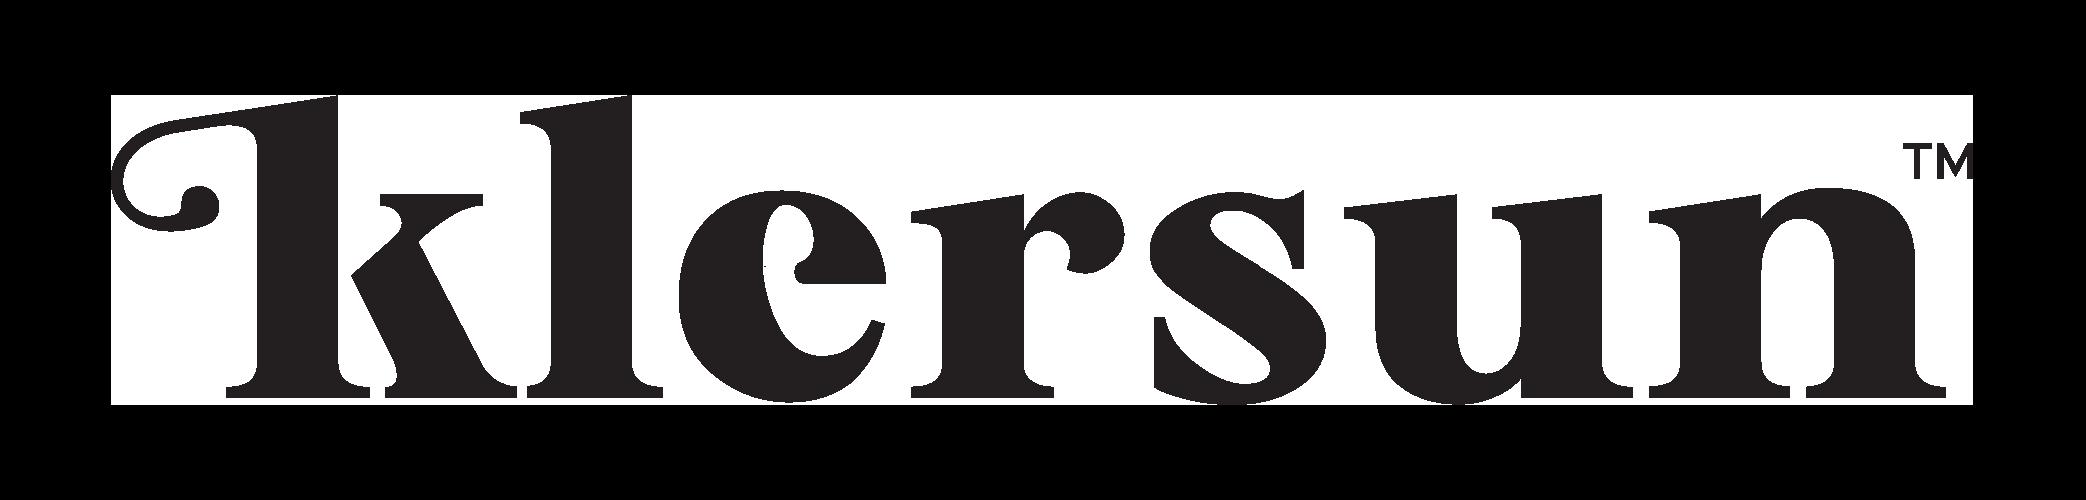 Klersun - sponsoring Cannabis Forum Summer 2020